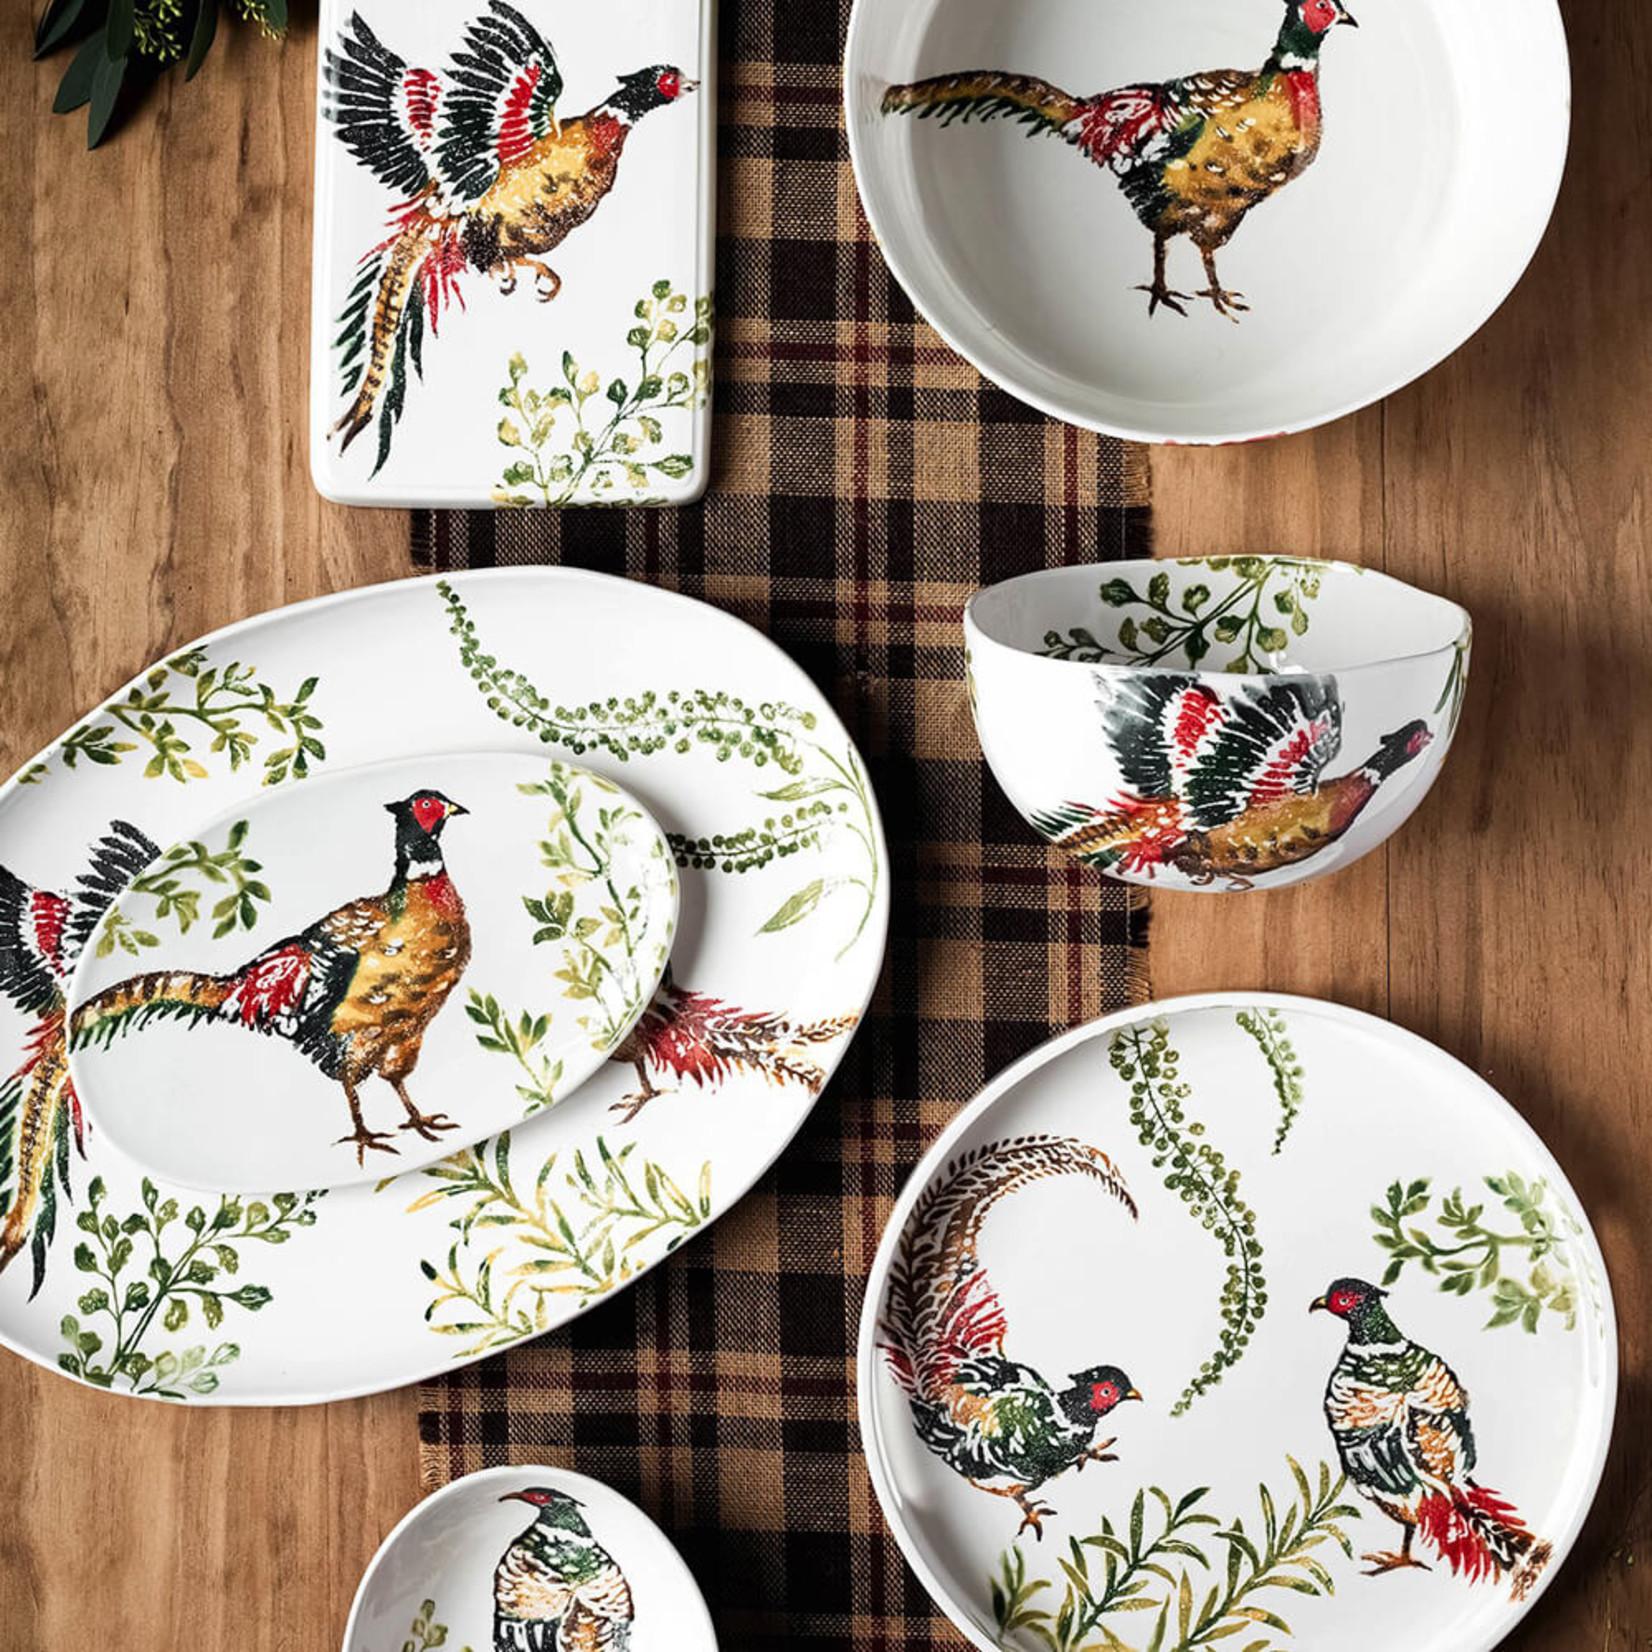 Vietri Fauna Pheasants Small Oval Platter